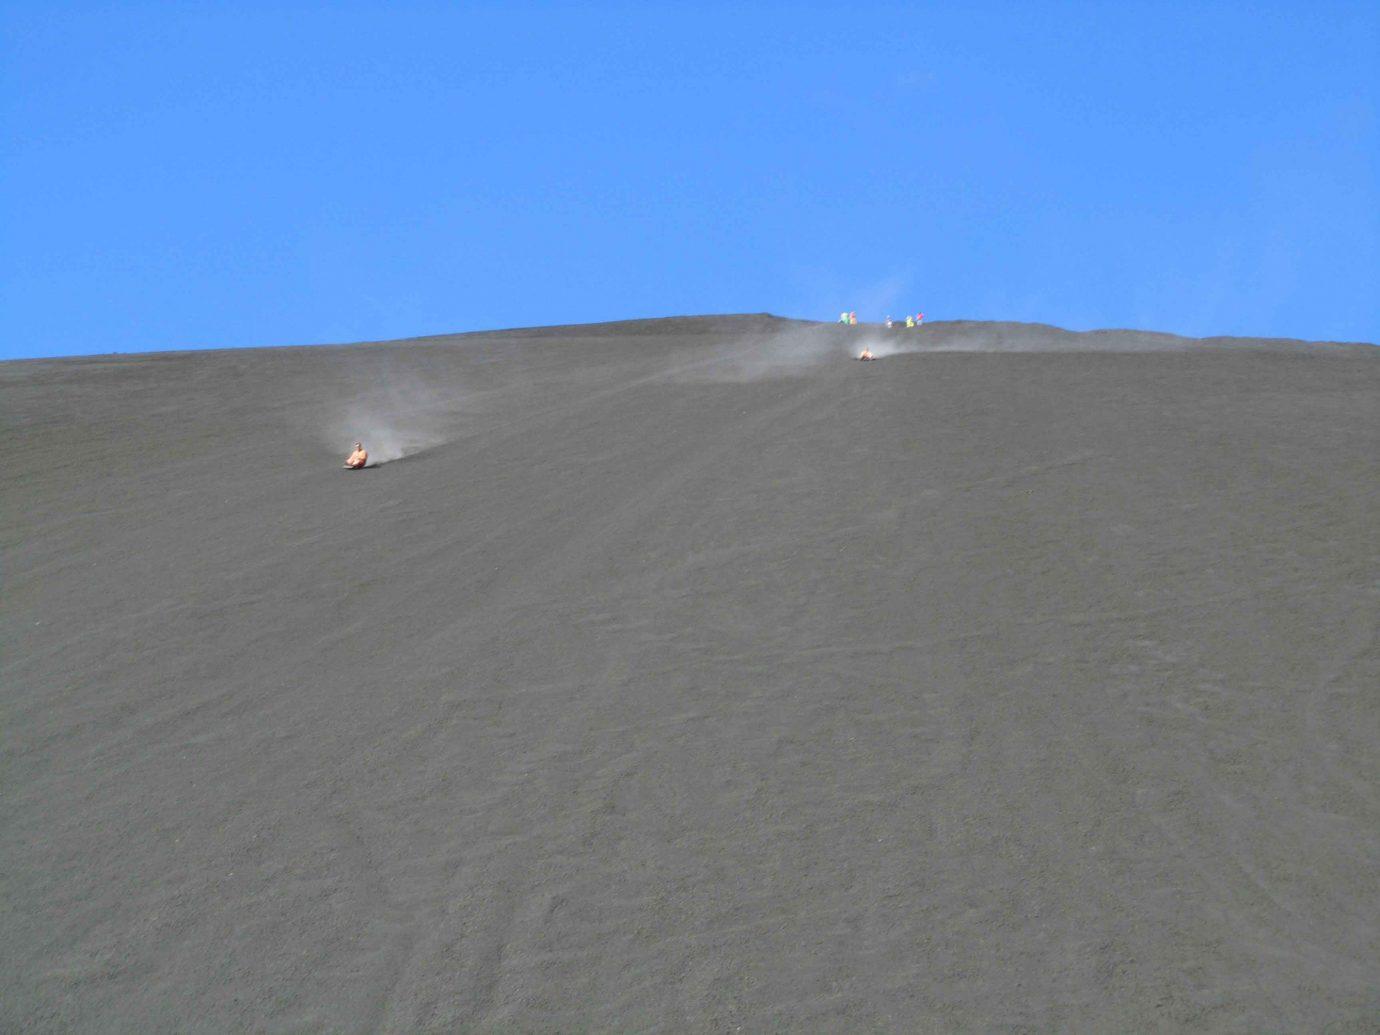 Offbeat sky outdoor habitat natural environment geographical feature landform dune Nature ecosystem aeolian landform sand plain material plateau sandy day